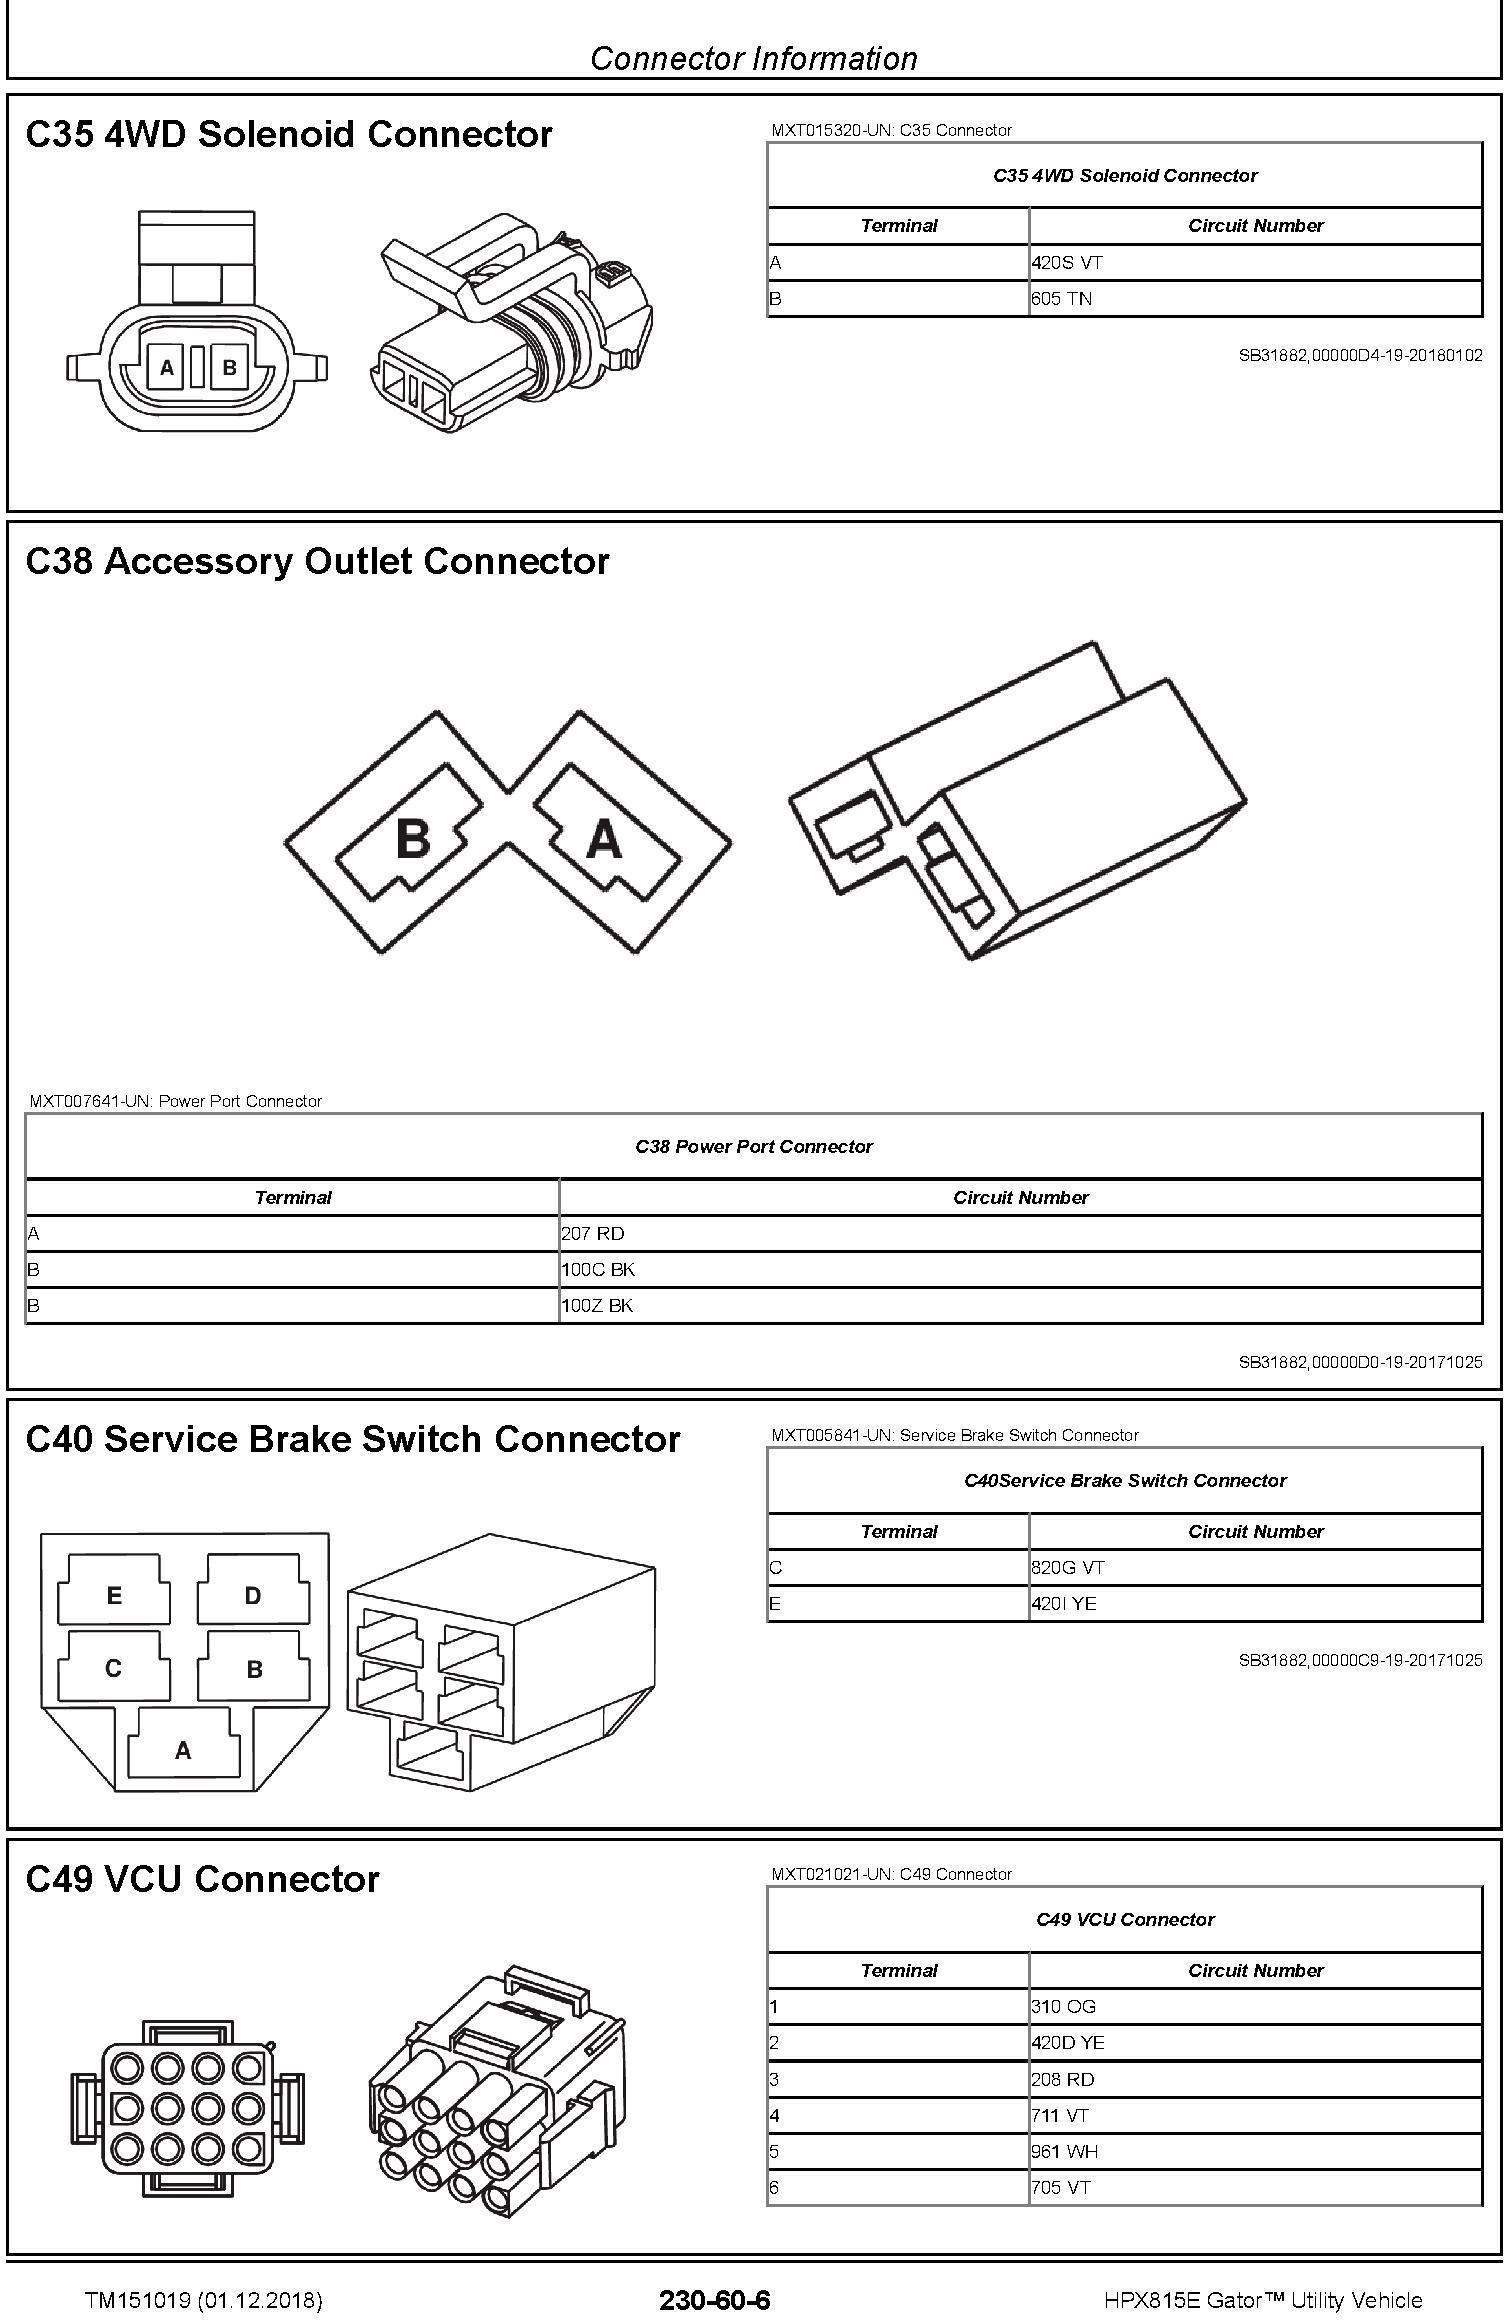 John Deere HPX815E Gator Utility Vehicle (SN. 010001-) Technical Service Manual (TM151019) - 2